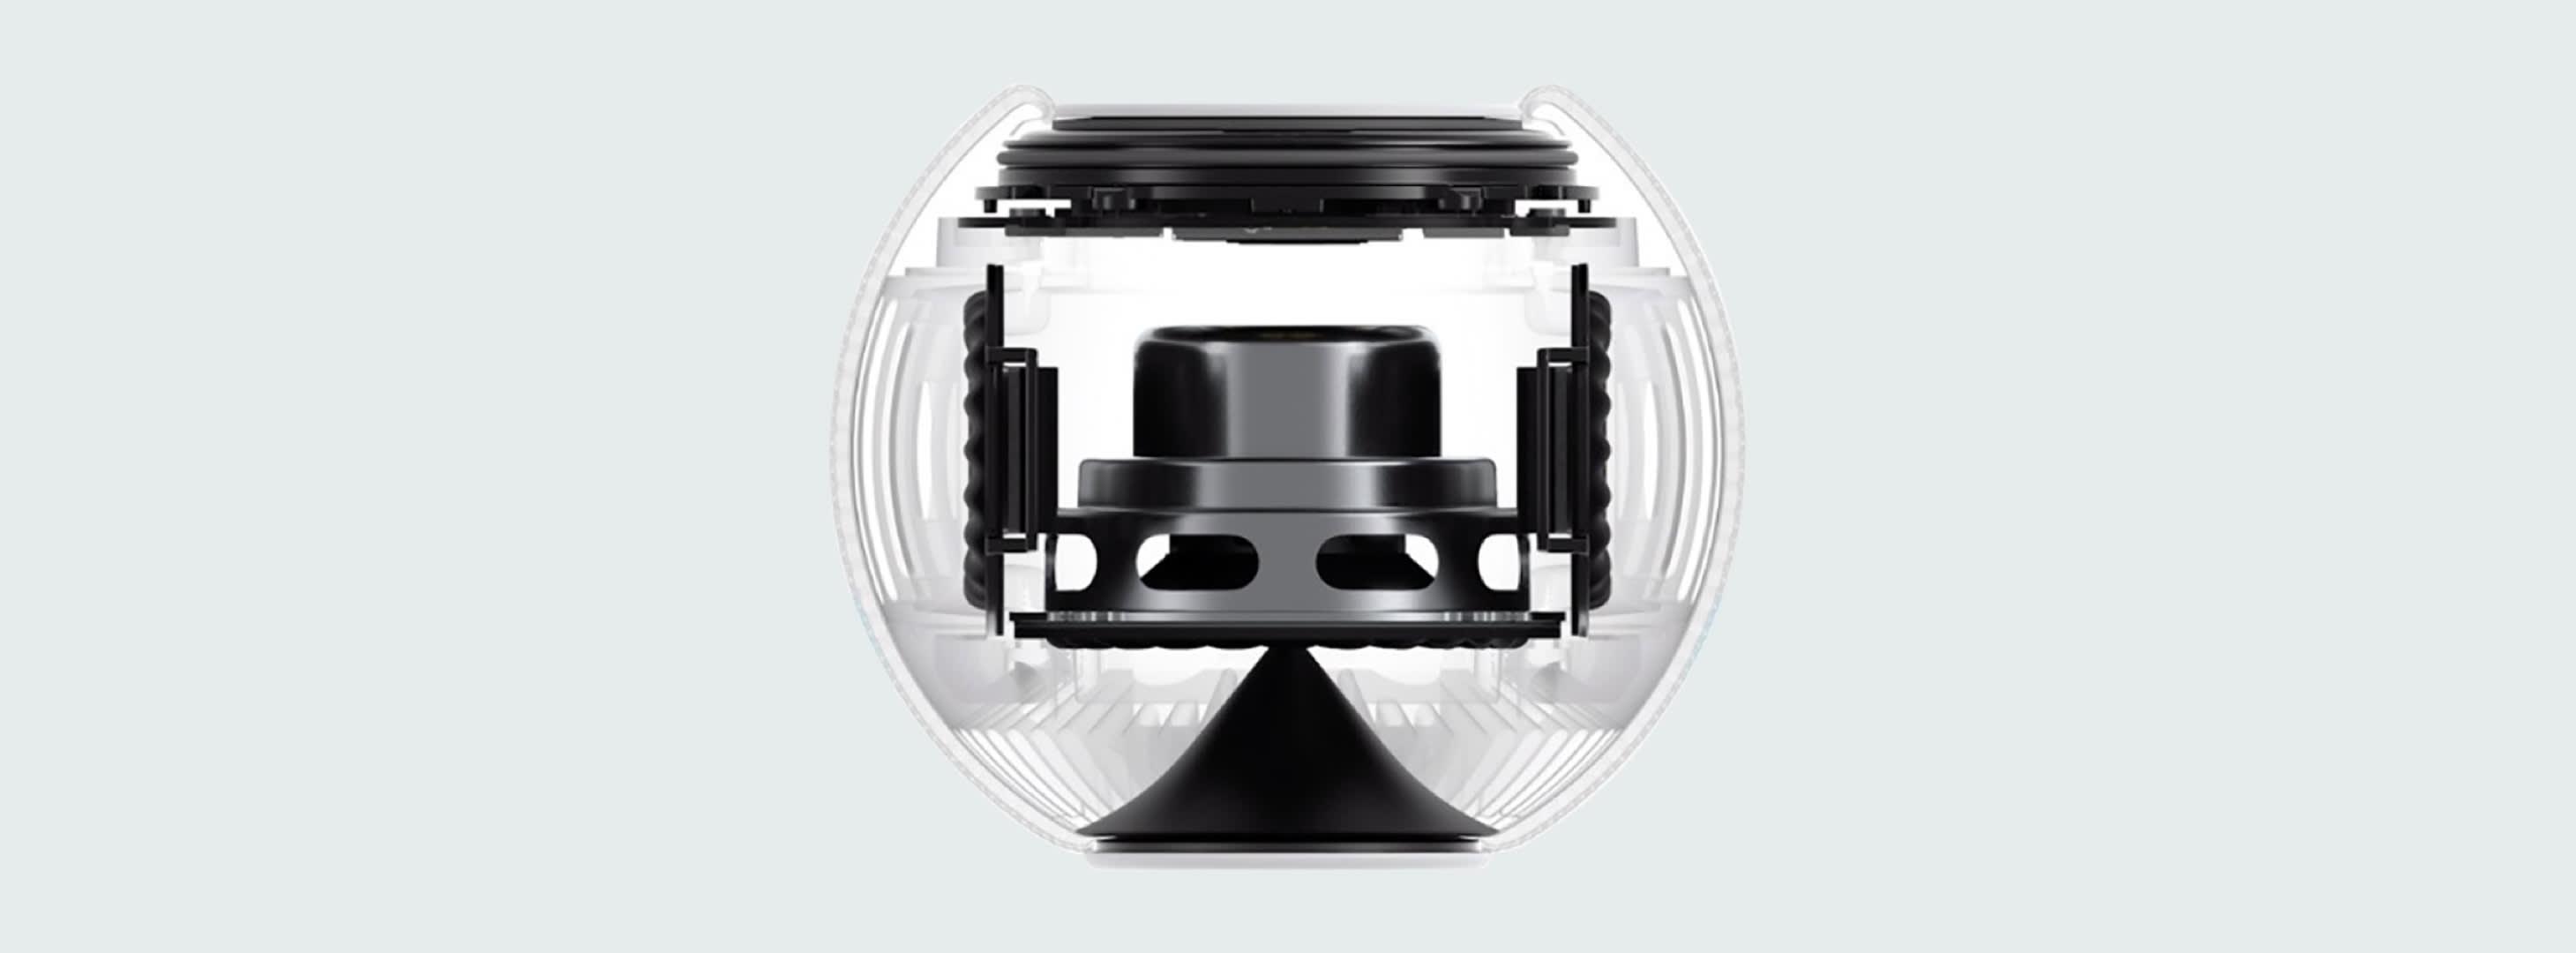 allapplenews-homepod-mini-inside